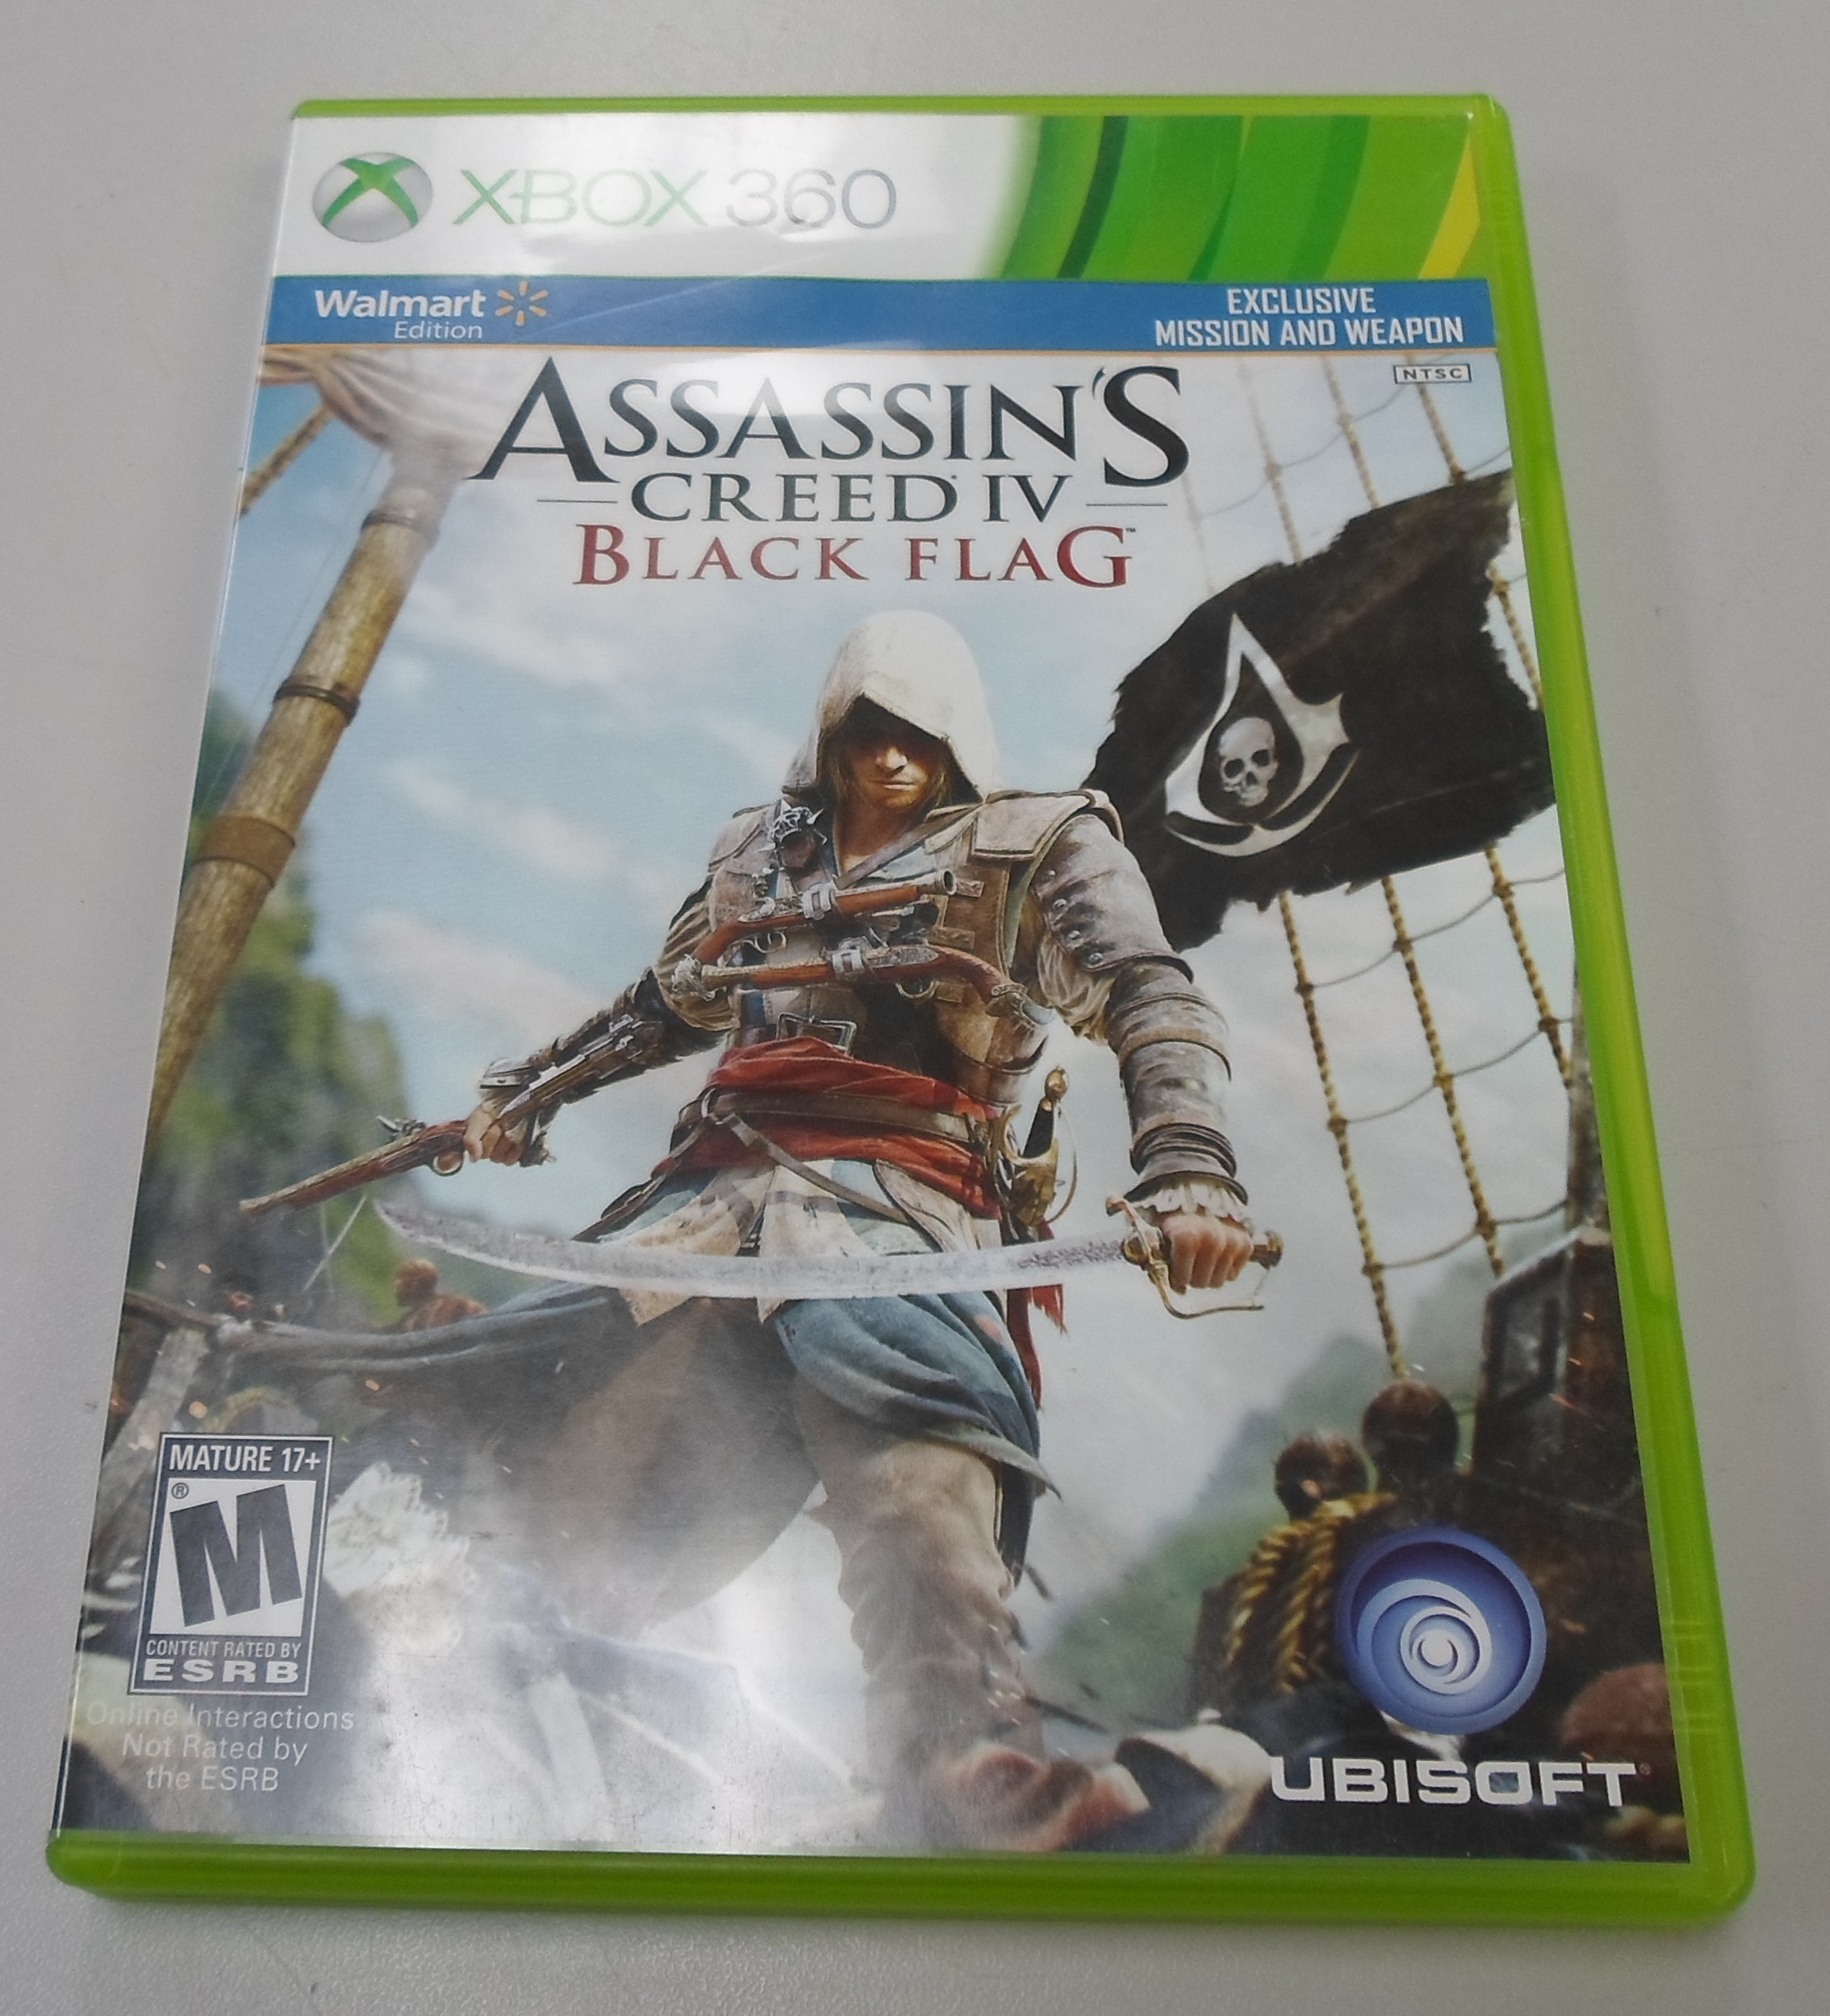 ASSASSIN'S CREED IV: BLACK FLAG  - XBOX 360 GAME